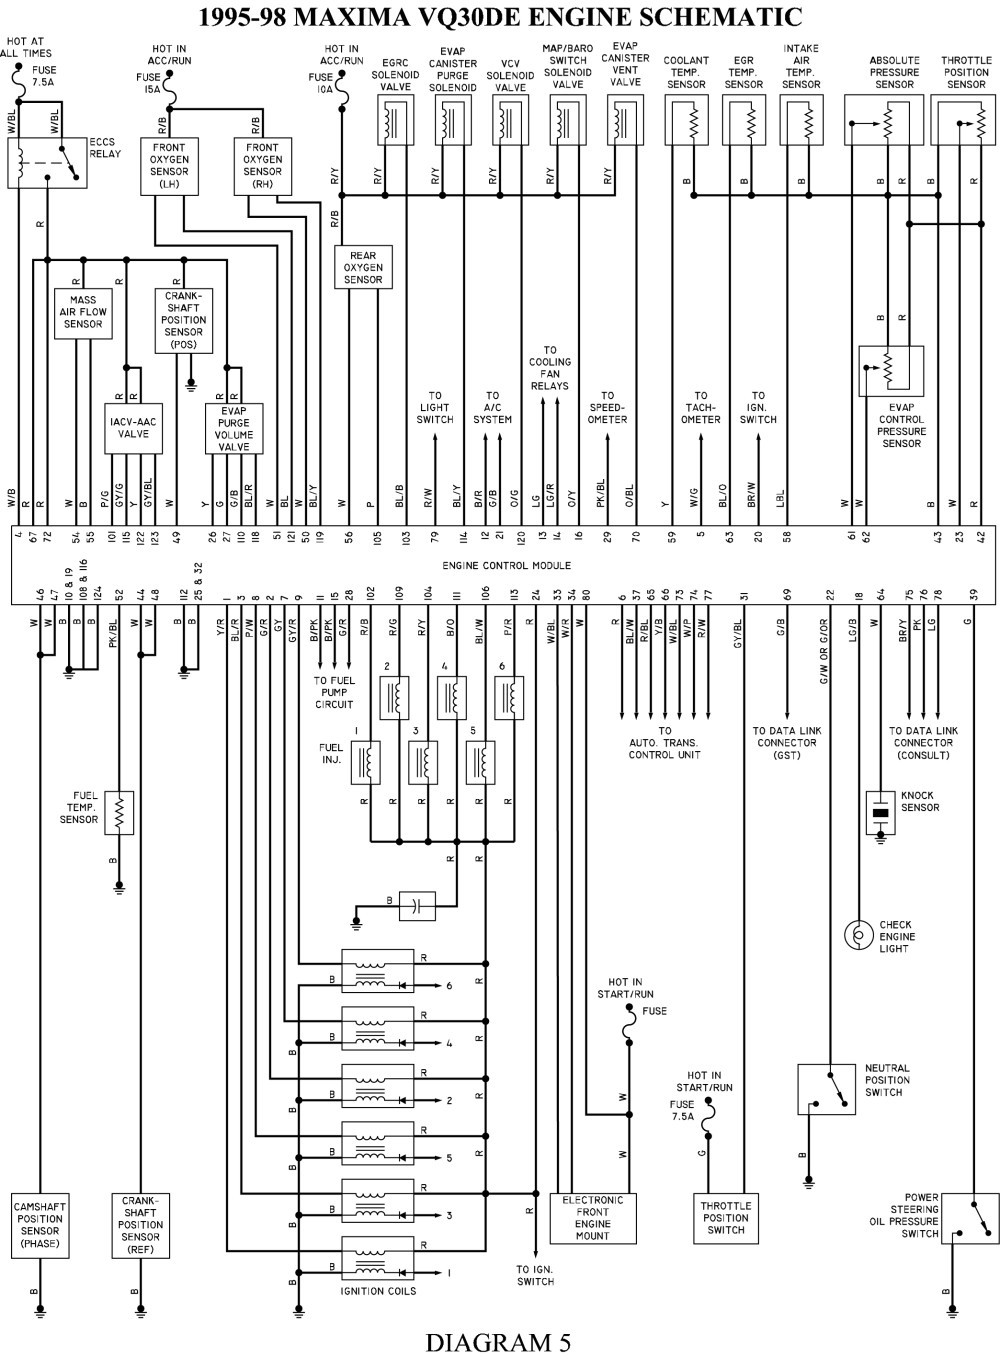 1998 Nissan Altima Wiring Diagram | Free Wiring Diagram on